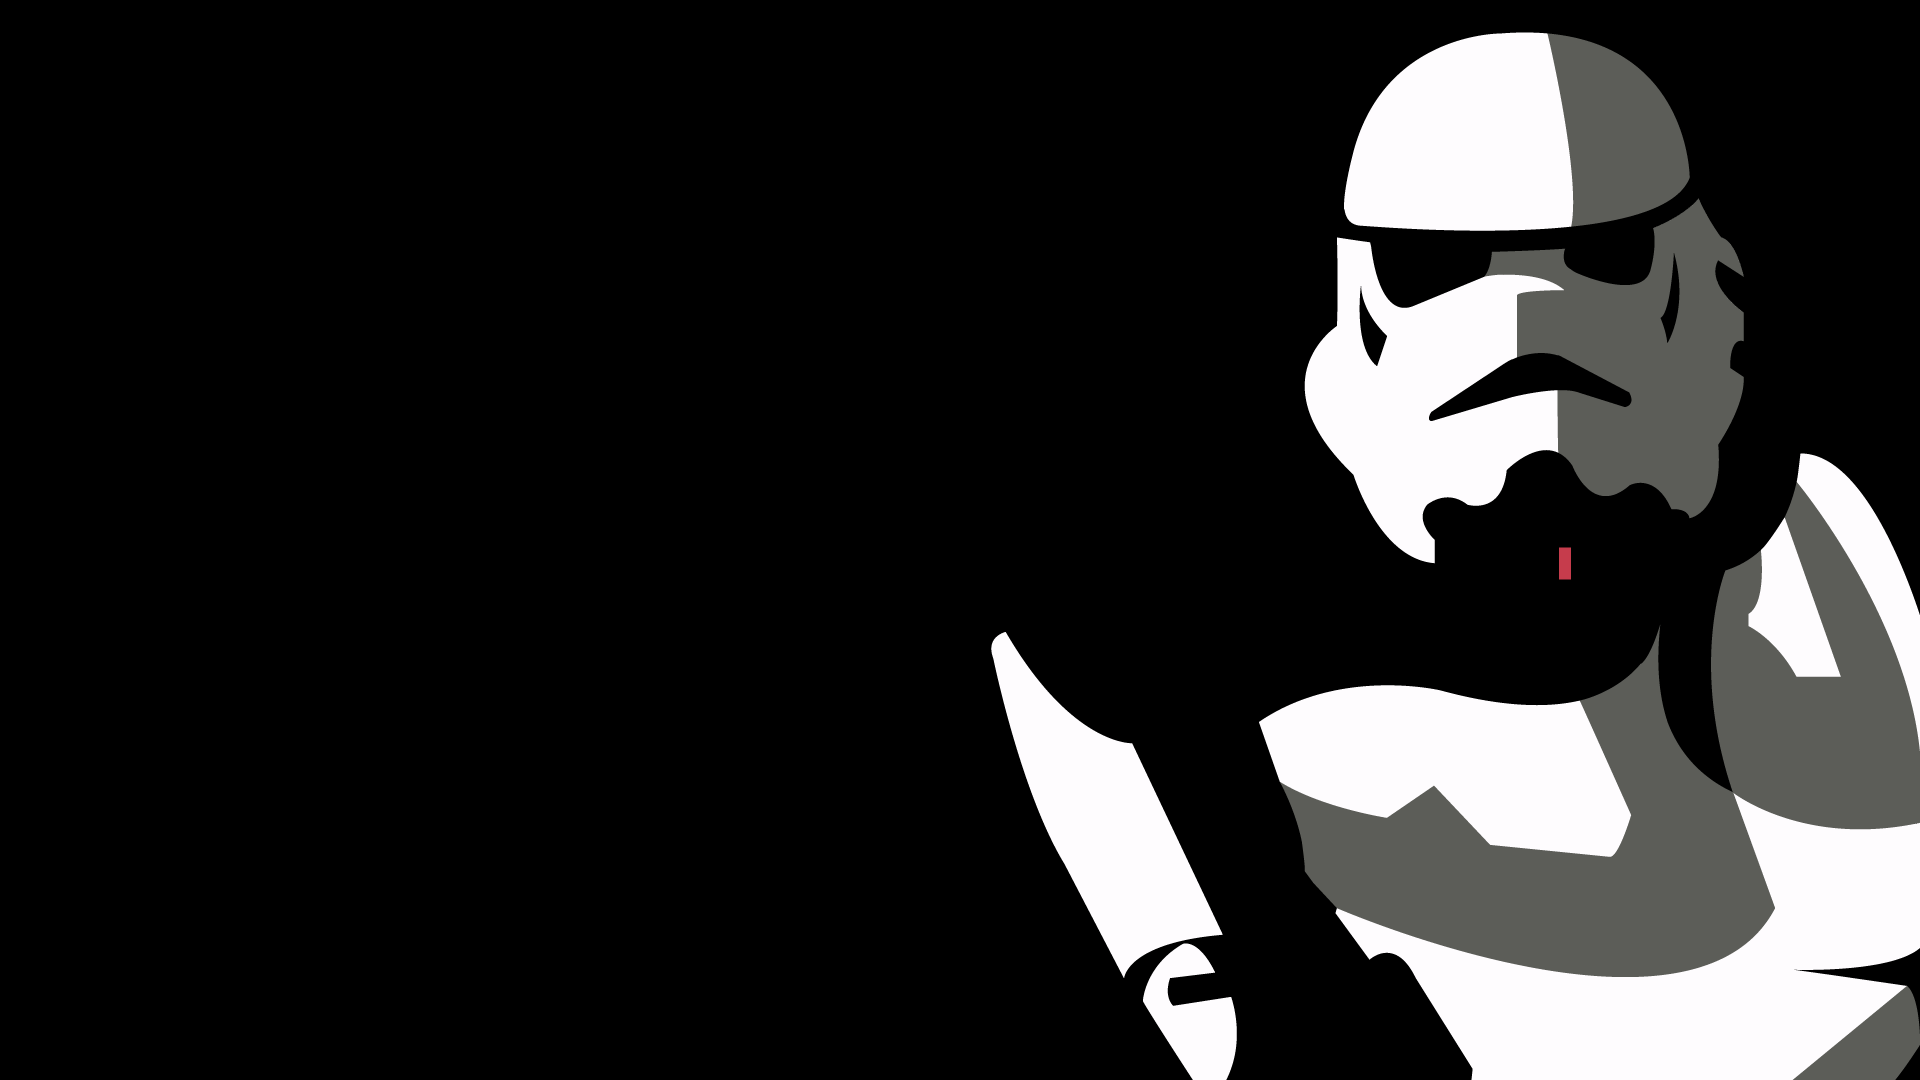 Star Wars Battlefront Trailer, Game Will Be 60 Fps